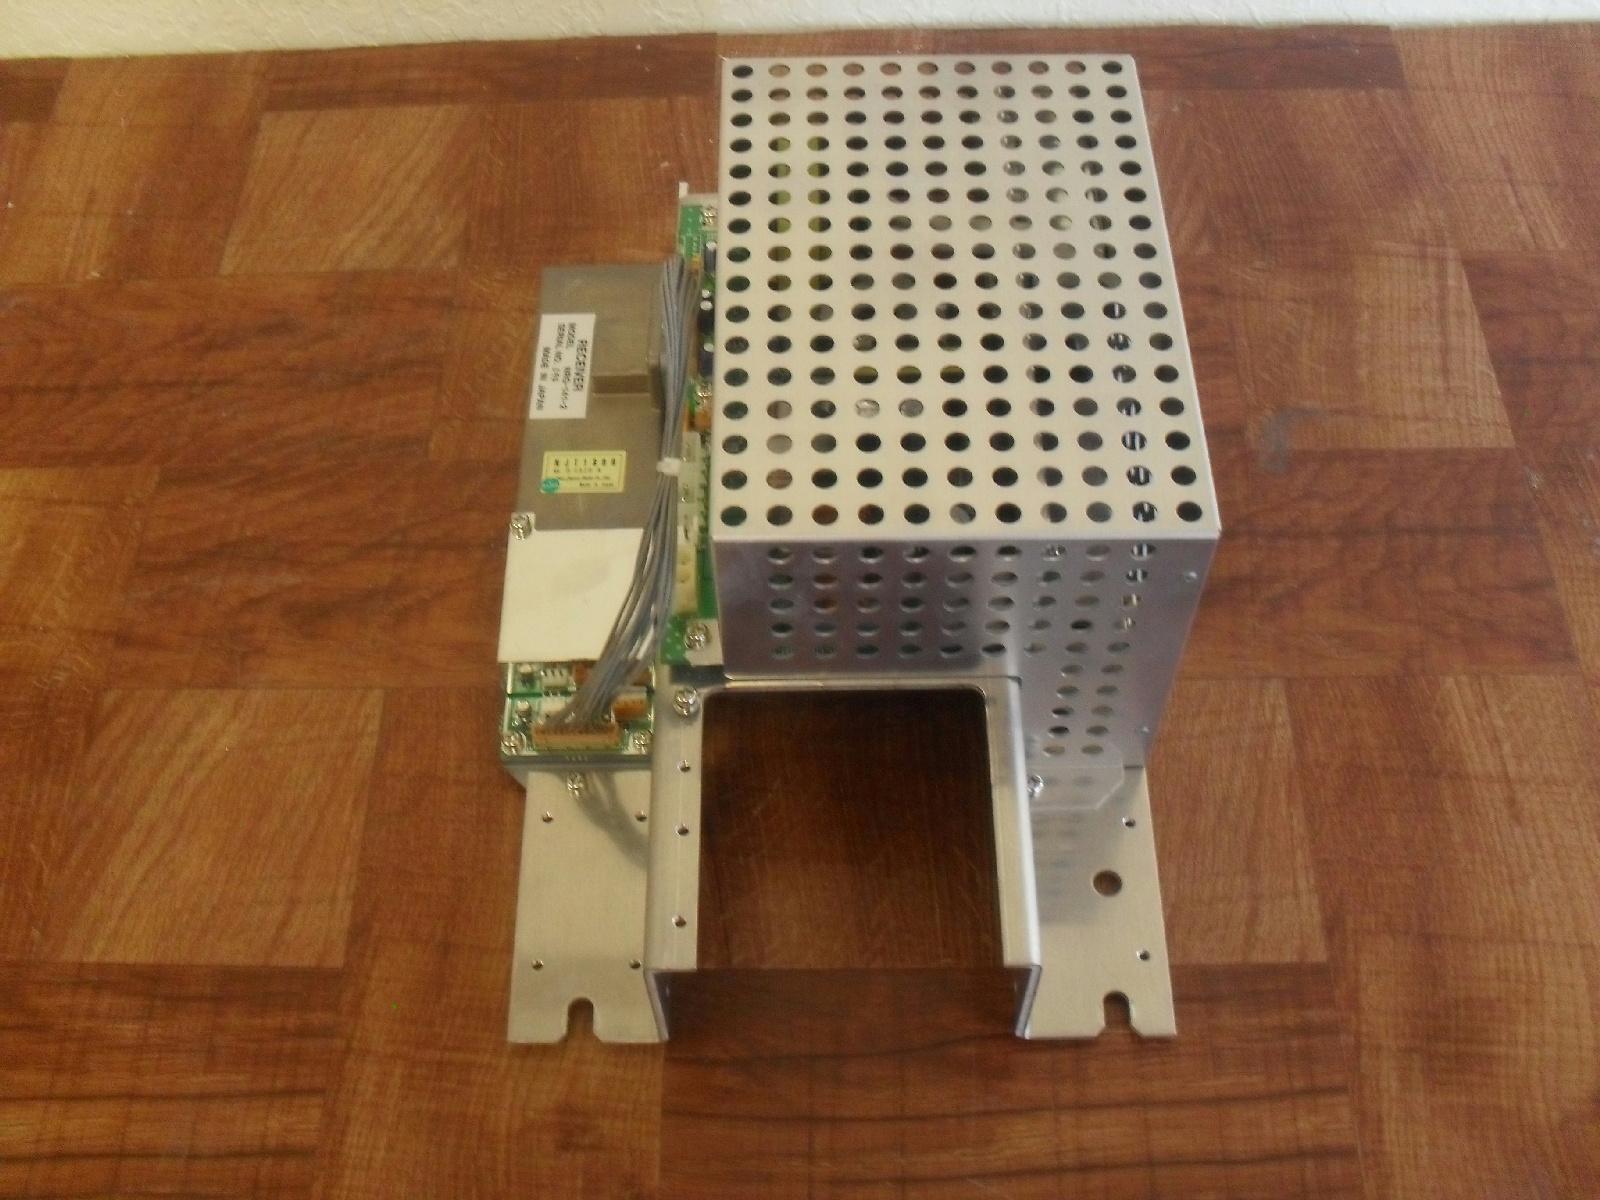 Simrad Northstar Jrc 6kw Hd Digital Radar Tr Core Pcb Circuit Board Image Is Loading